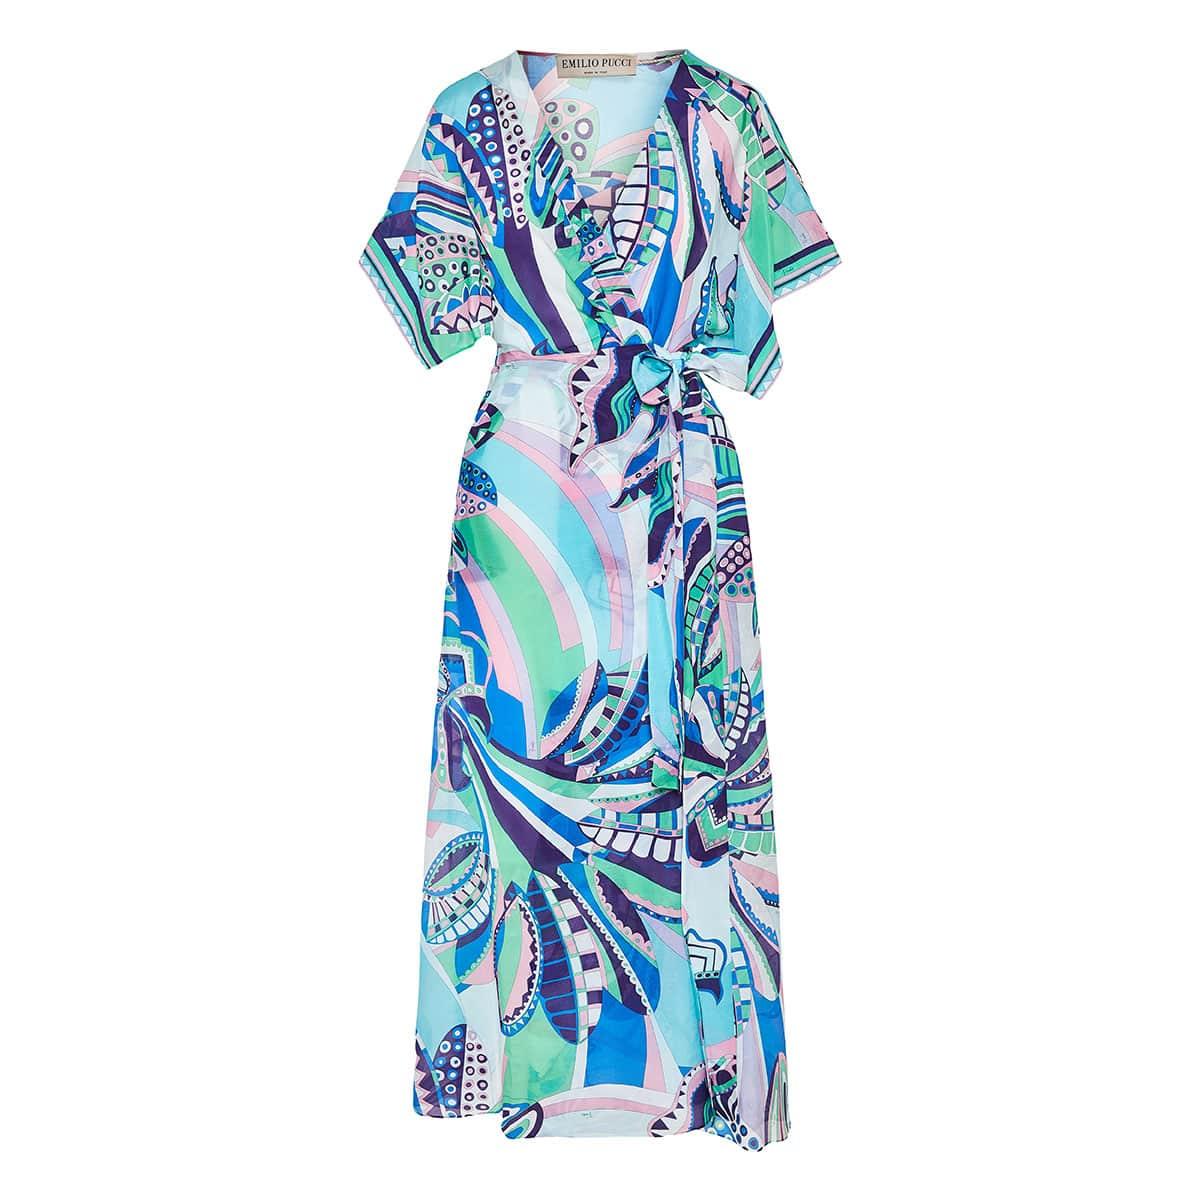 Corisco print robe dress